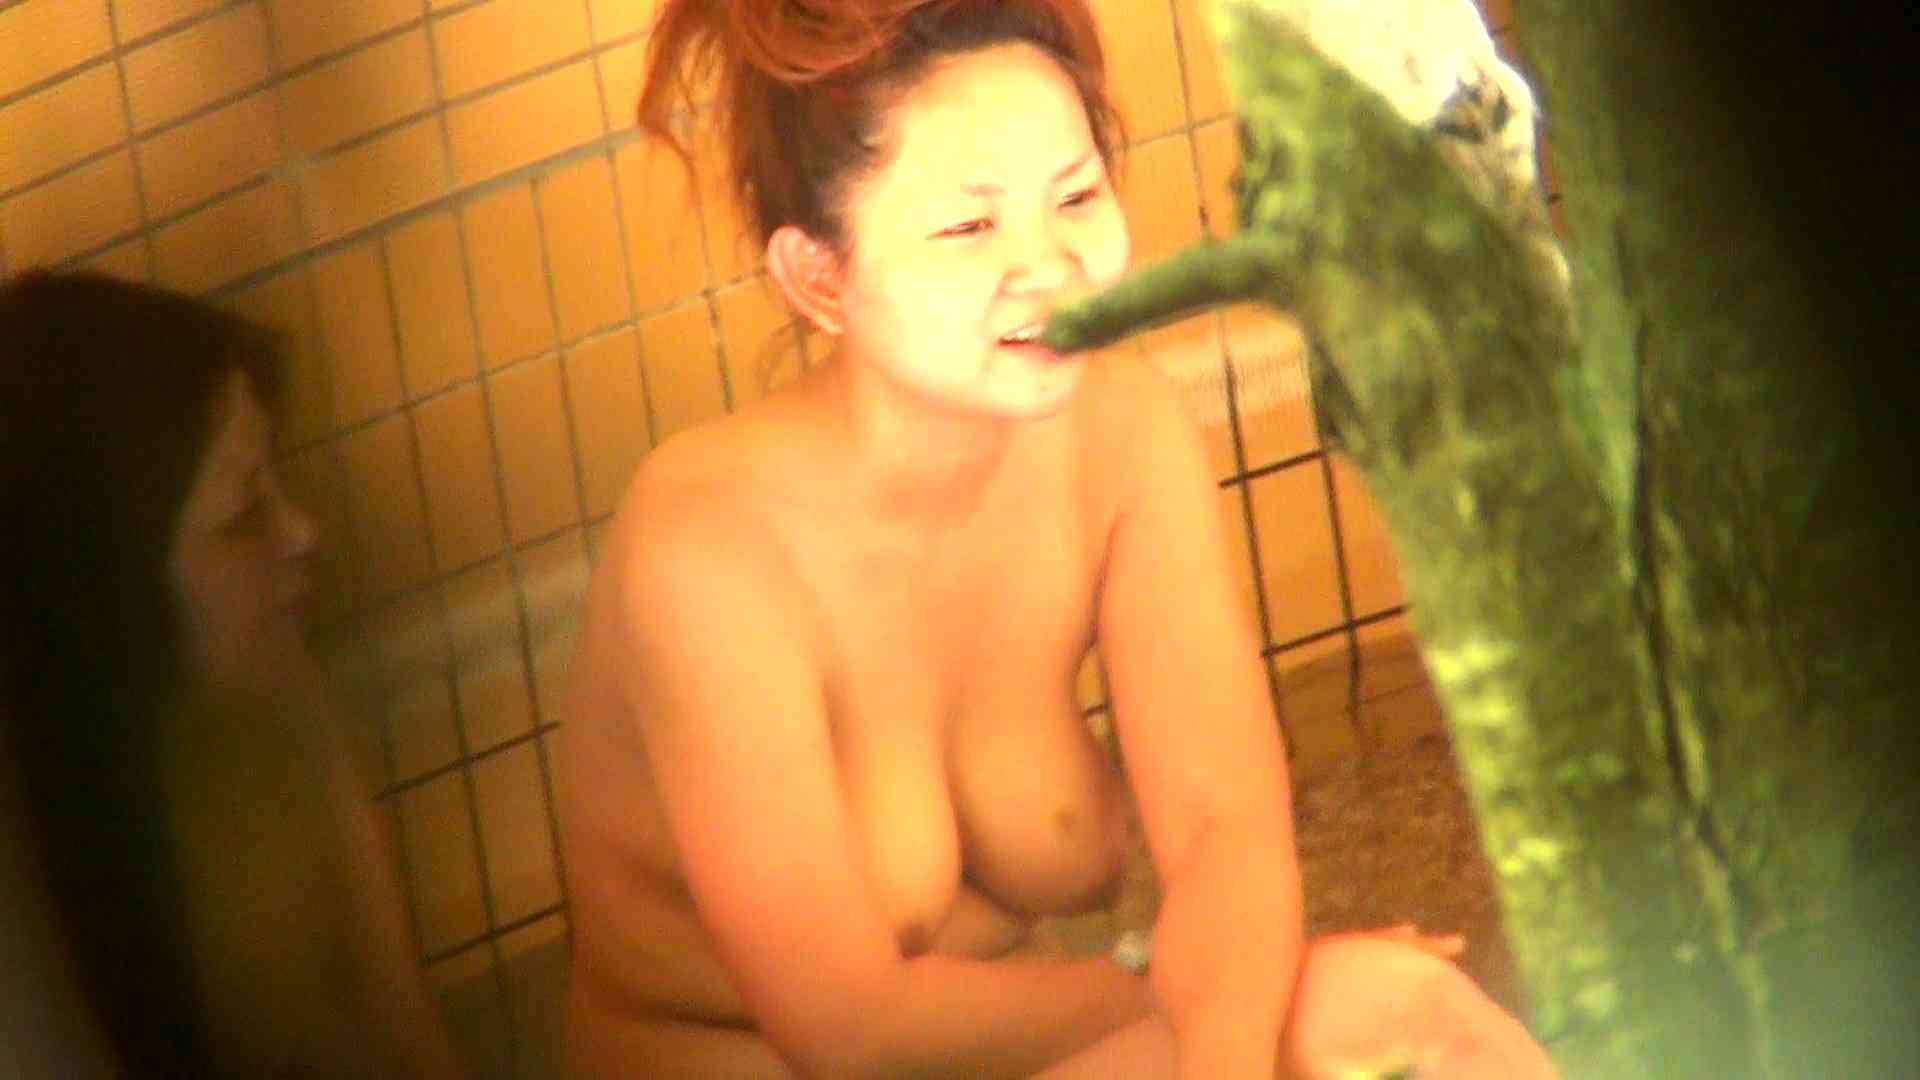 Aquaな露天風呂Vol.267 盗撮   HなOL  91pic 77